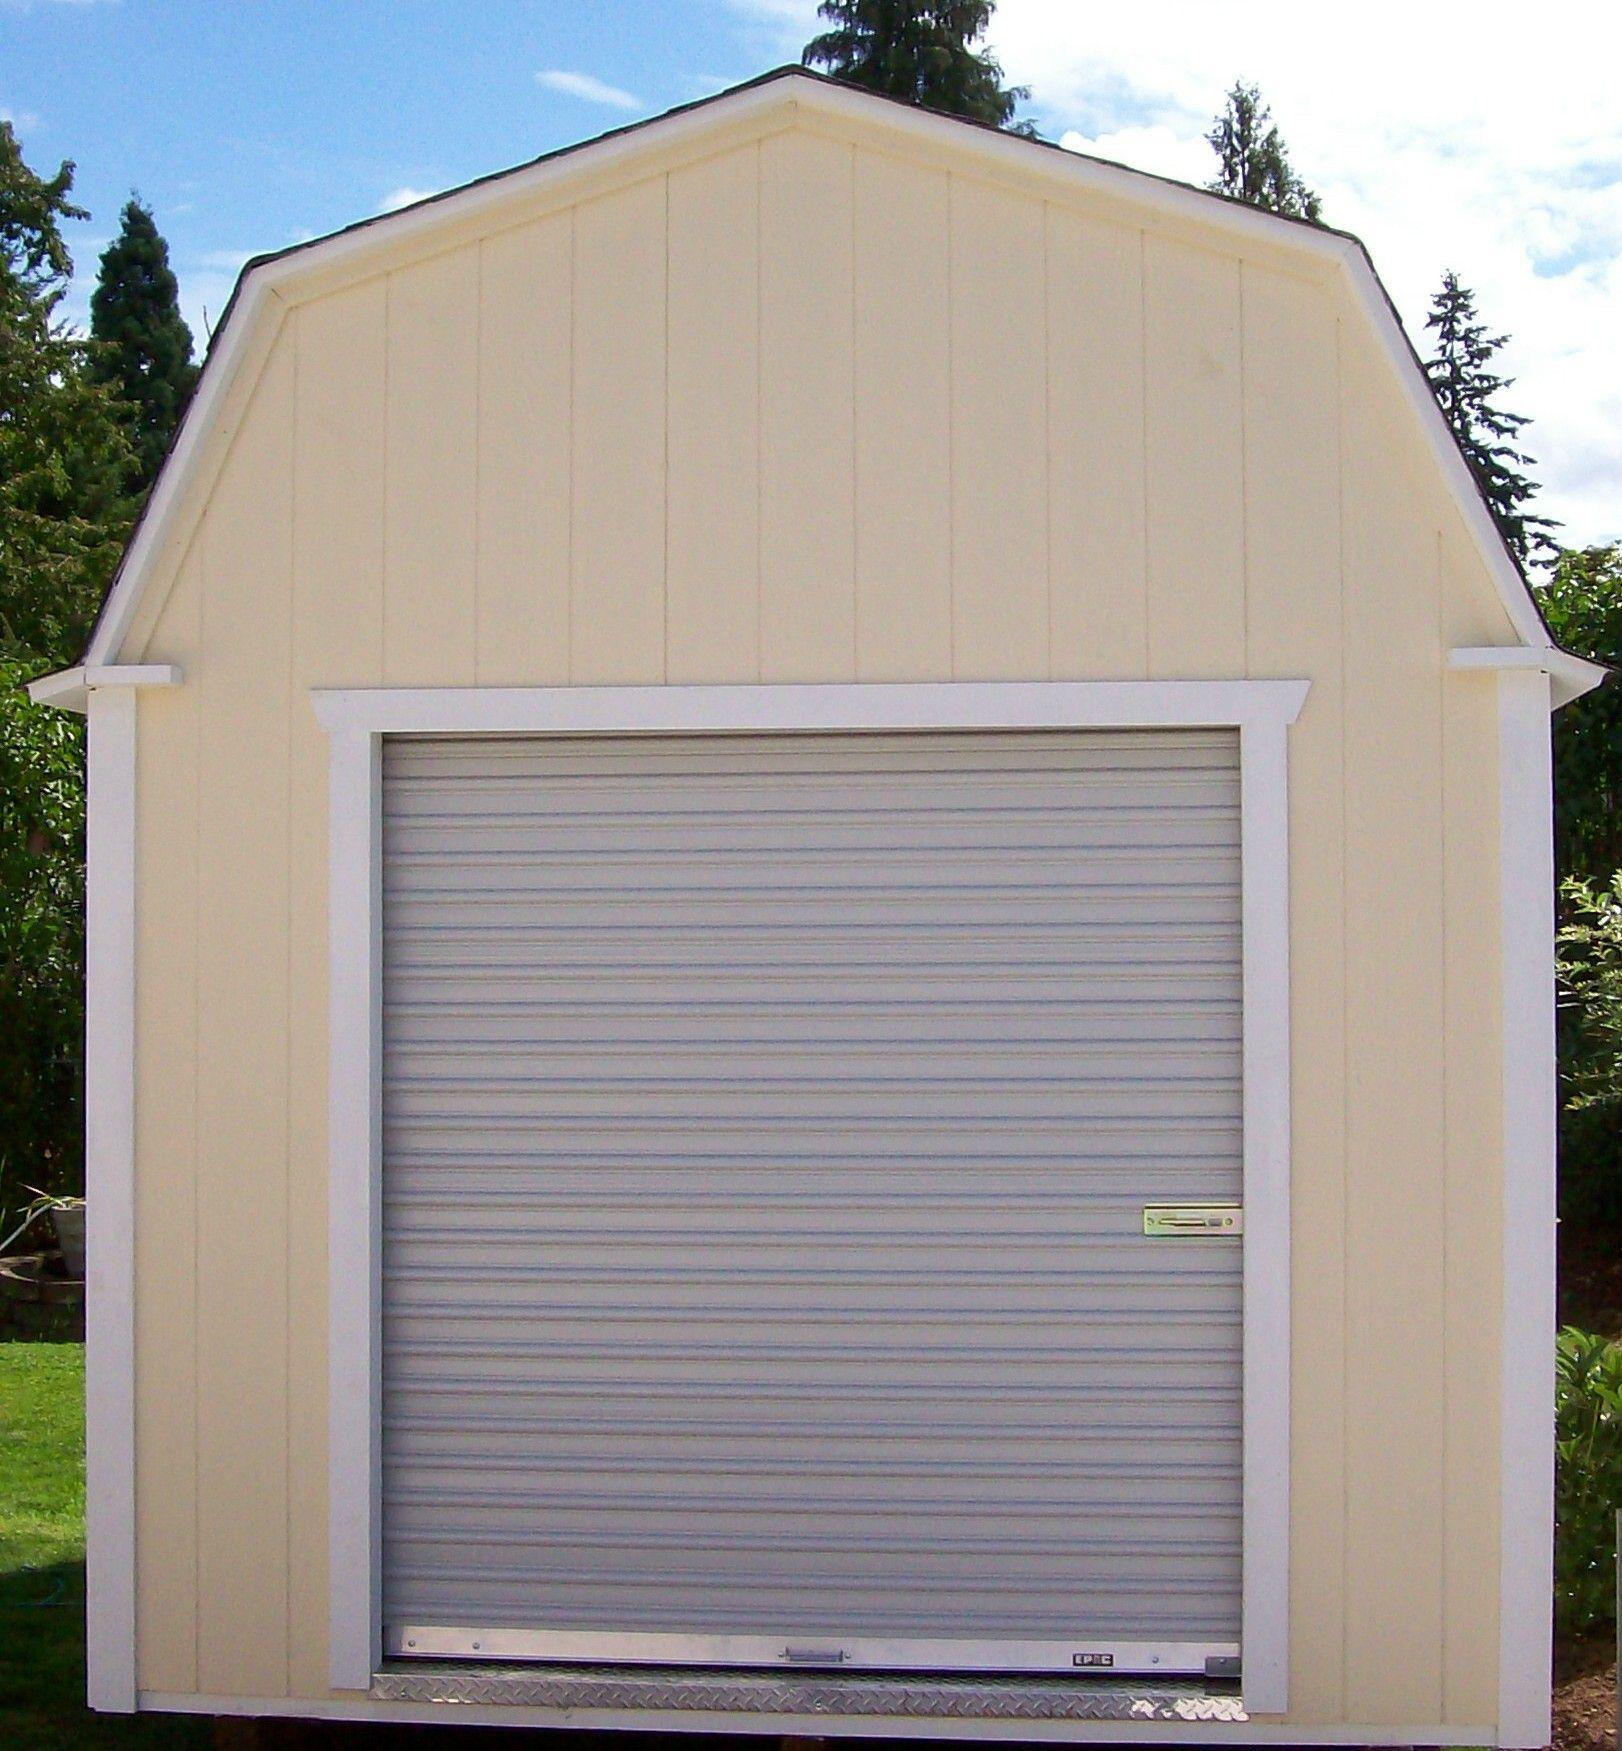 Barn style with roll up door storage garden shed tool for Garden shed with roller door